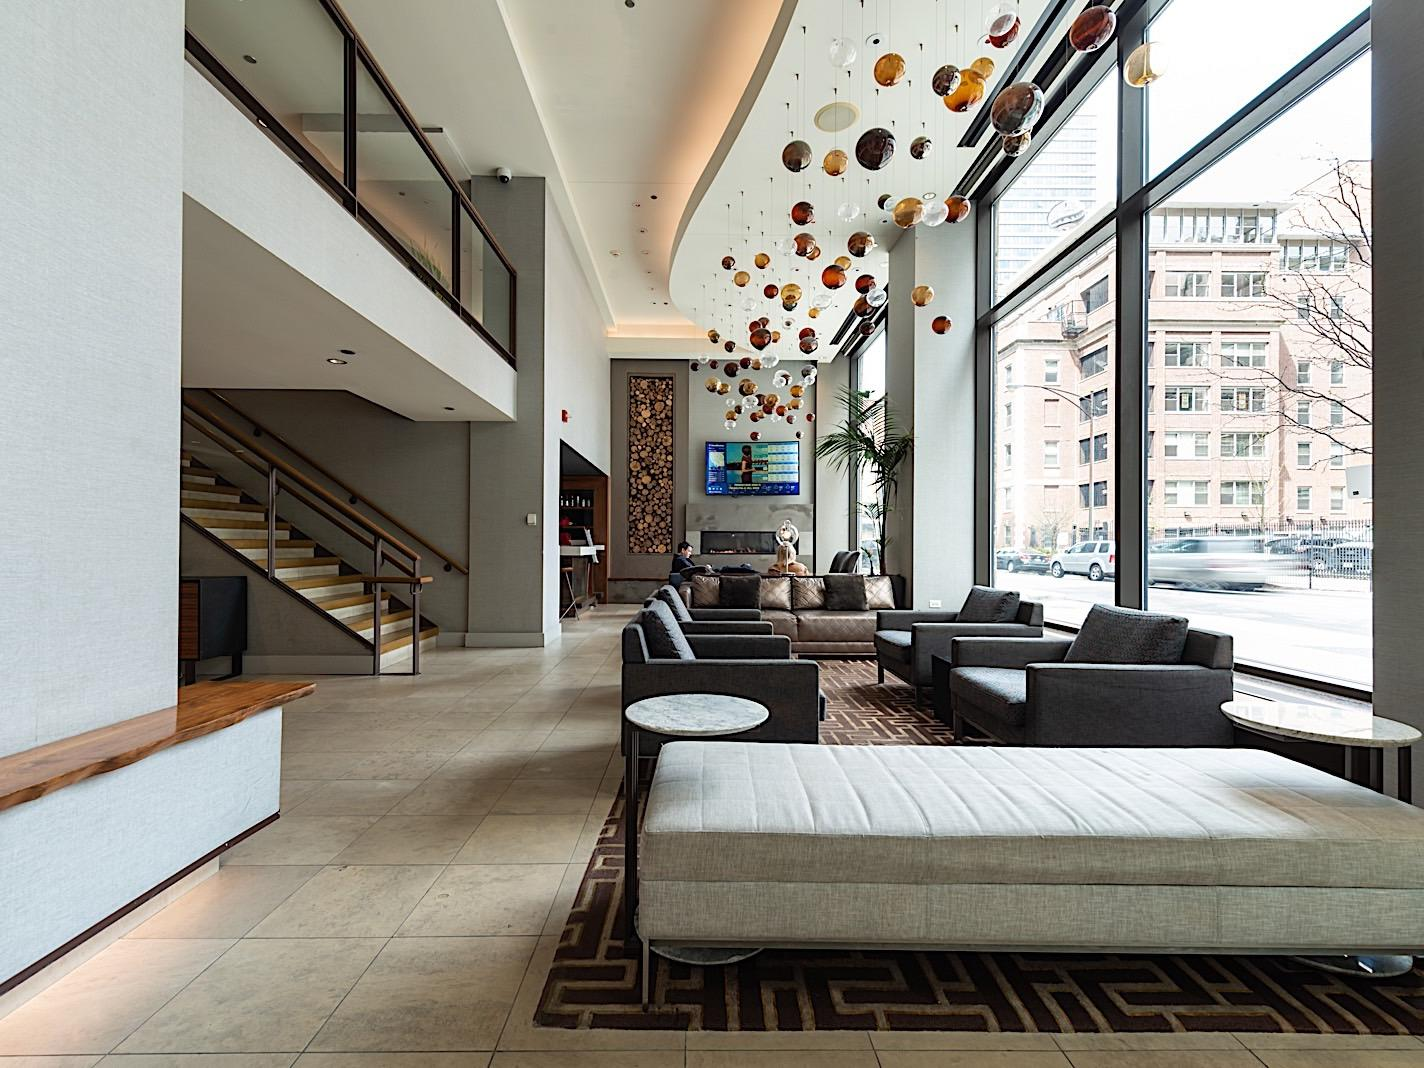 Downtown Chicago Hotel Deals Affordable Boutique Hotel Felix